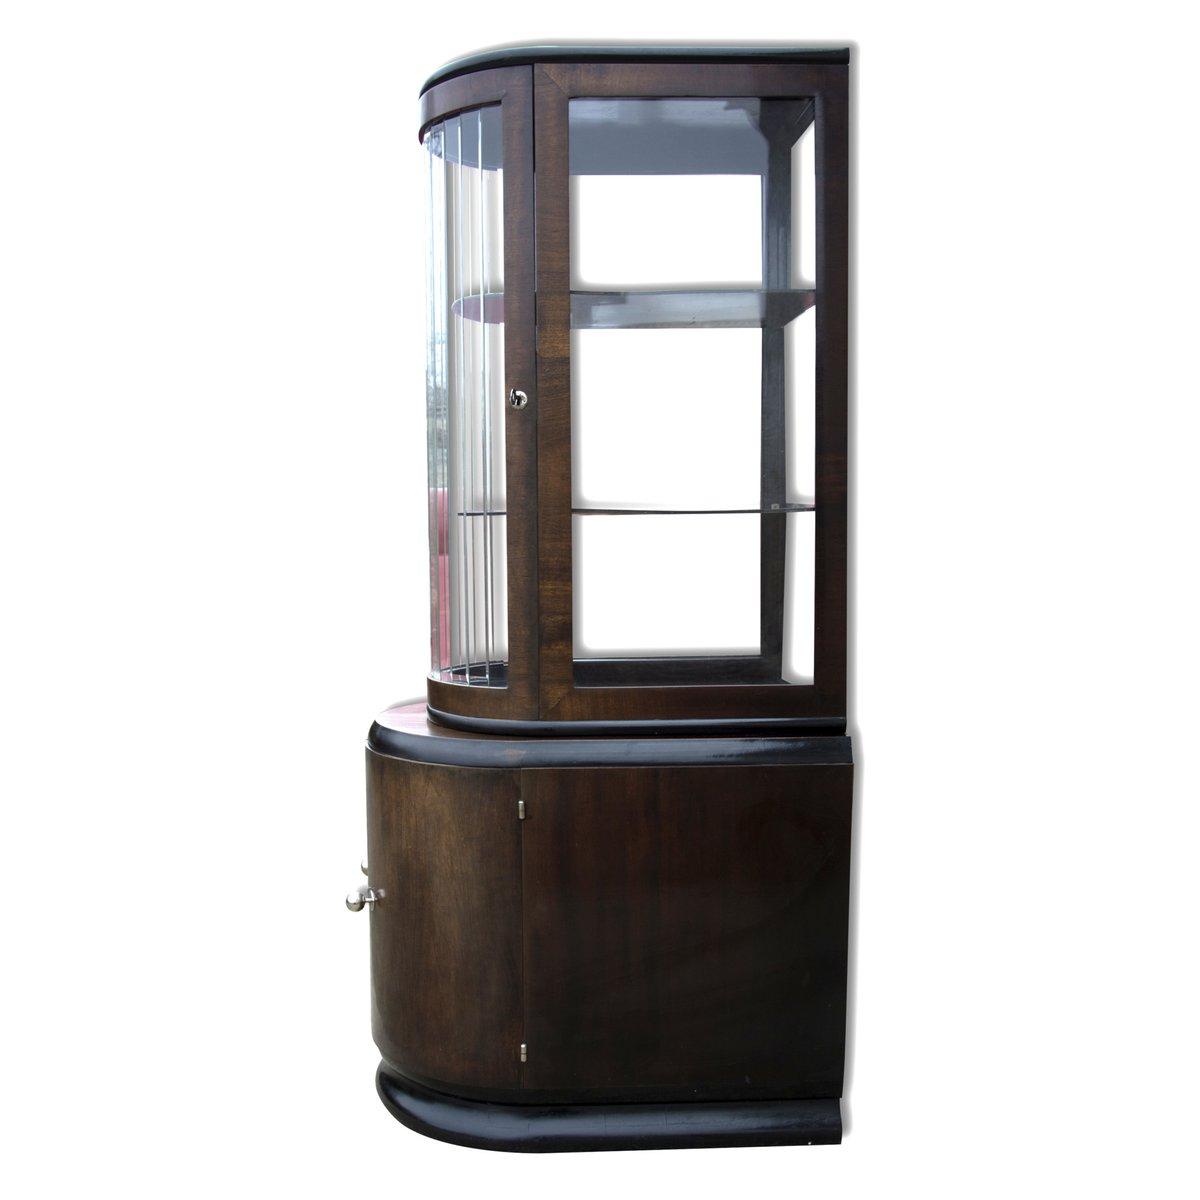 Art deco walnut veneer liquor cabinet 1930s for sale at for Meuble art deco 1930